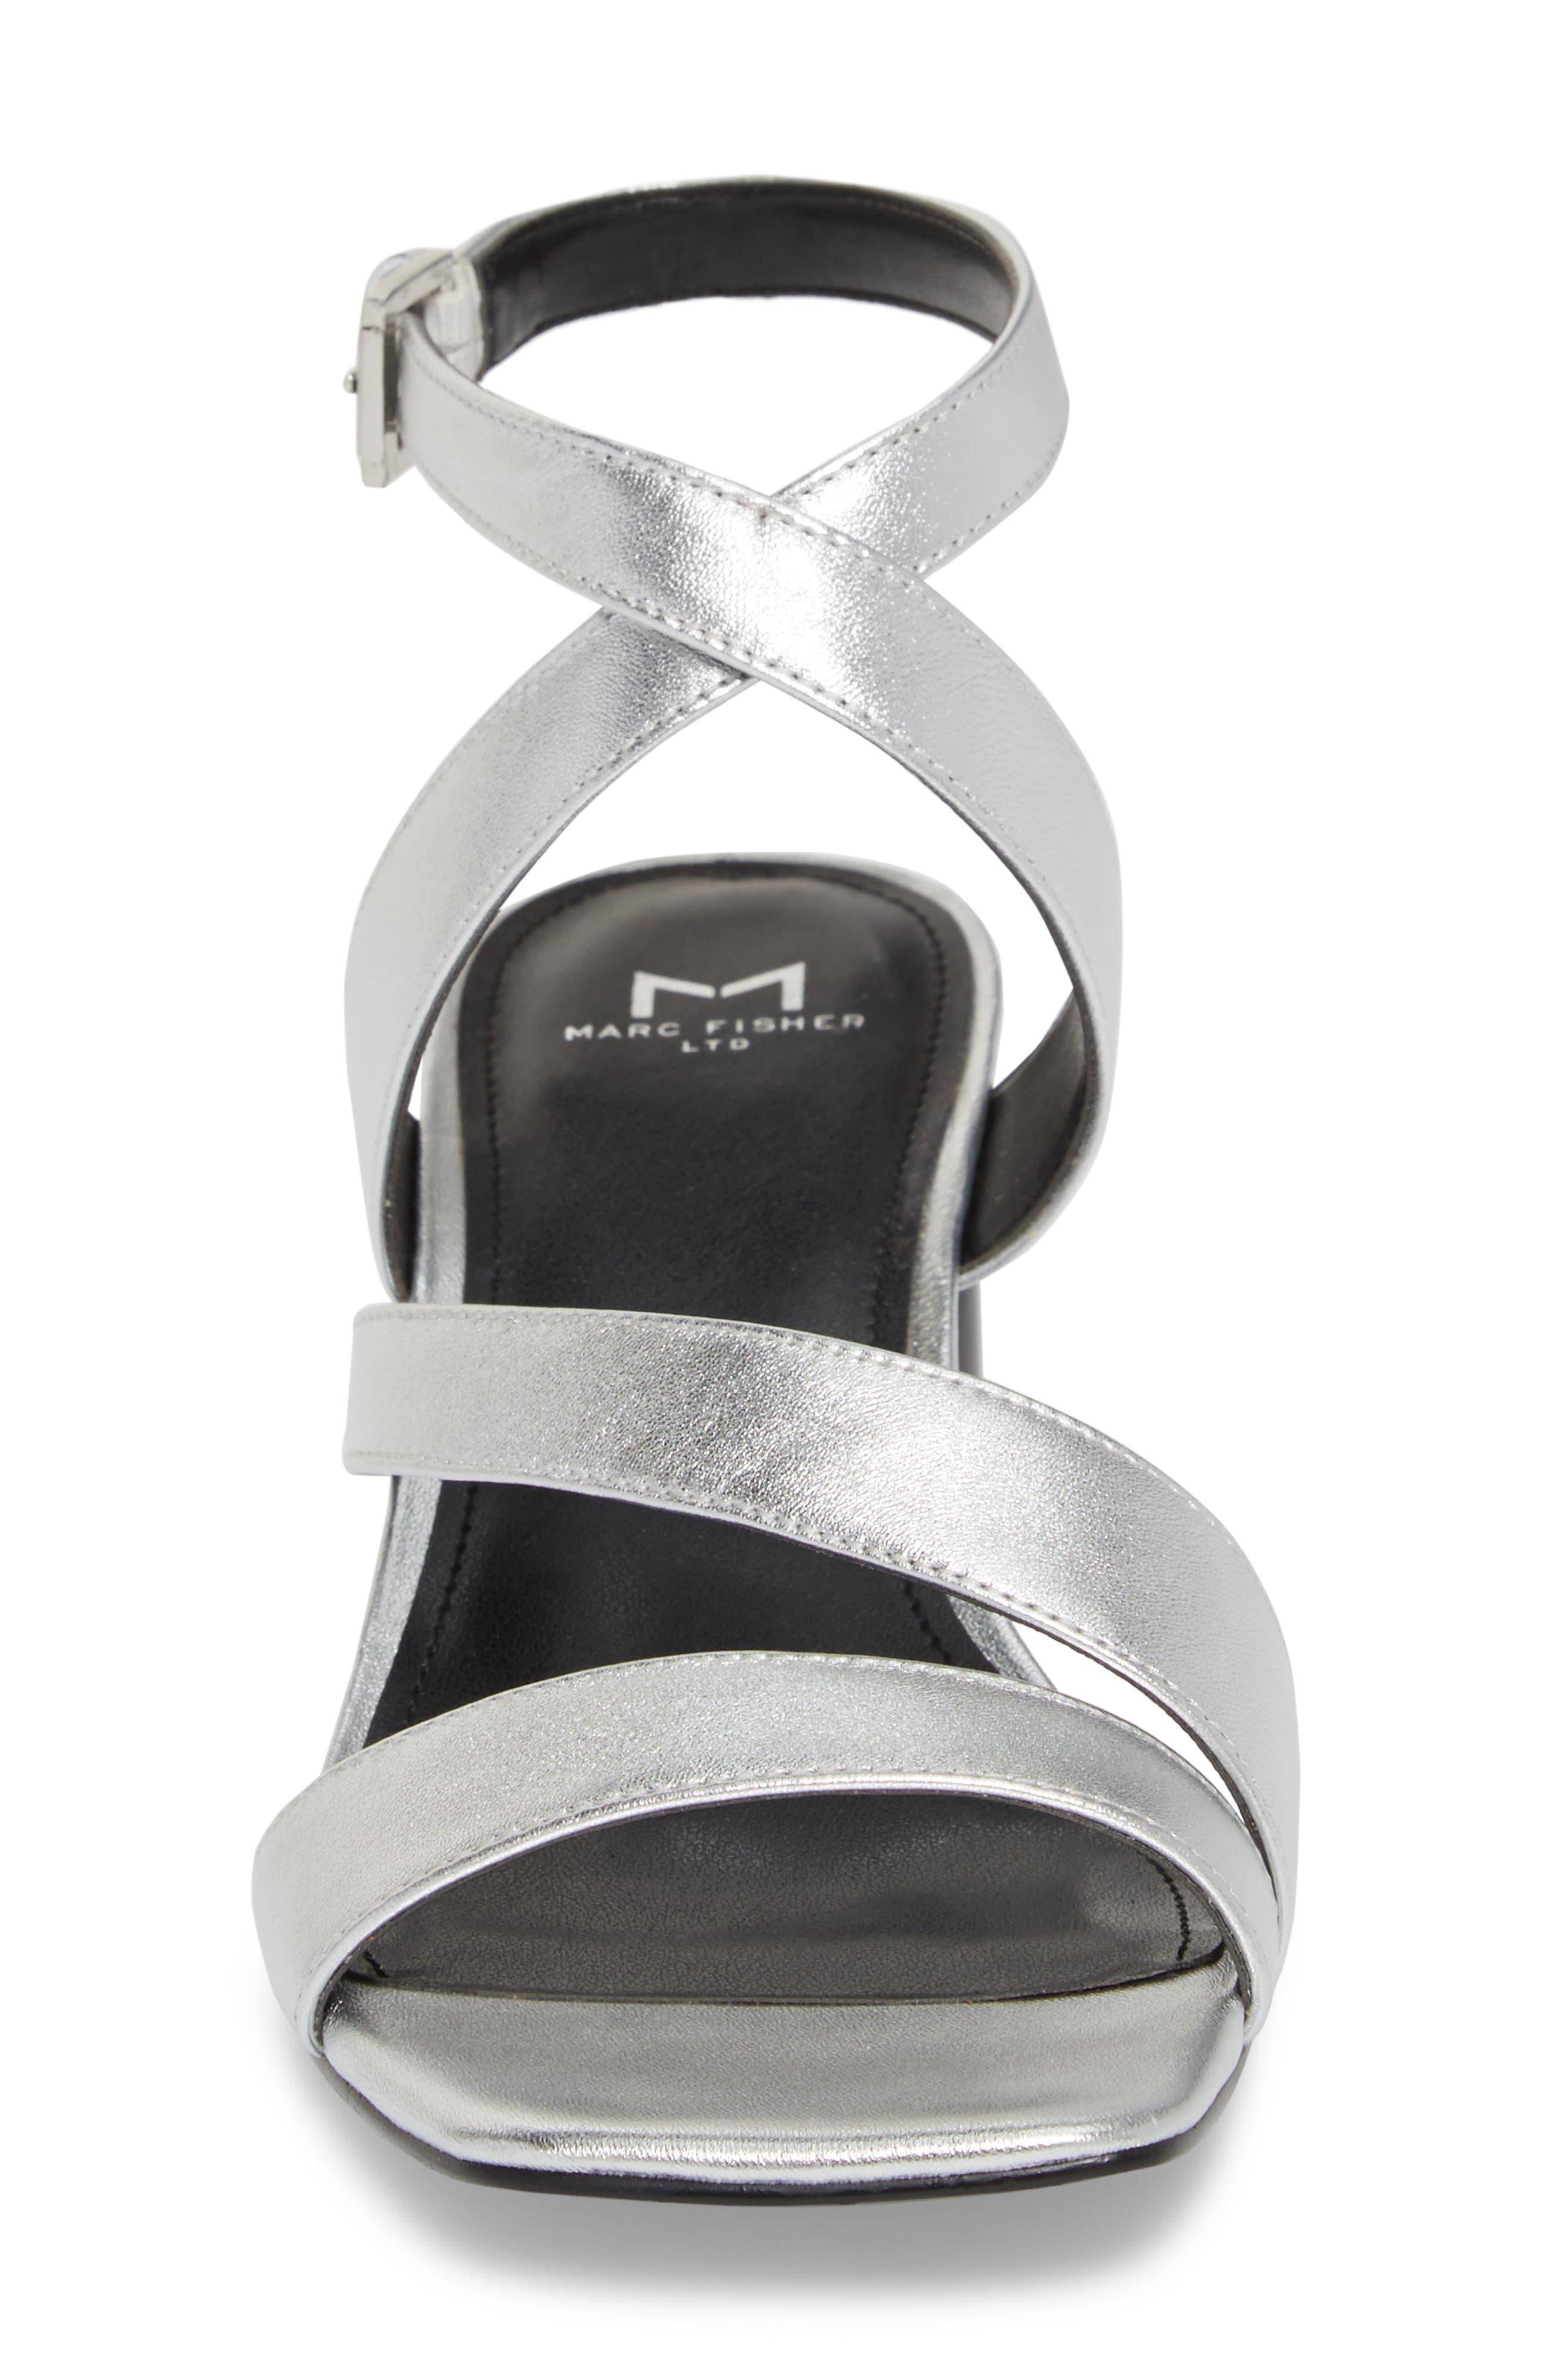 Marc Fischer LTD Idana Strappy Sandal,                             Alternate thumbnail 4, color,                             Silver Leather